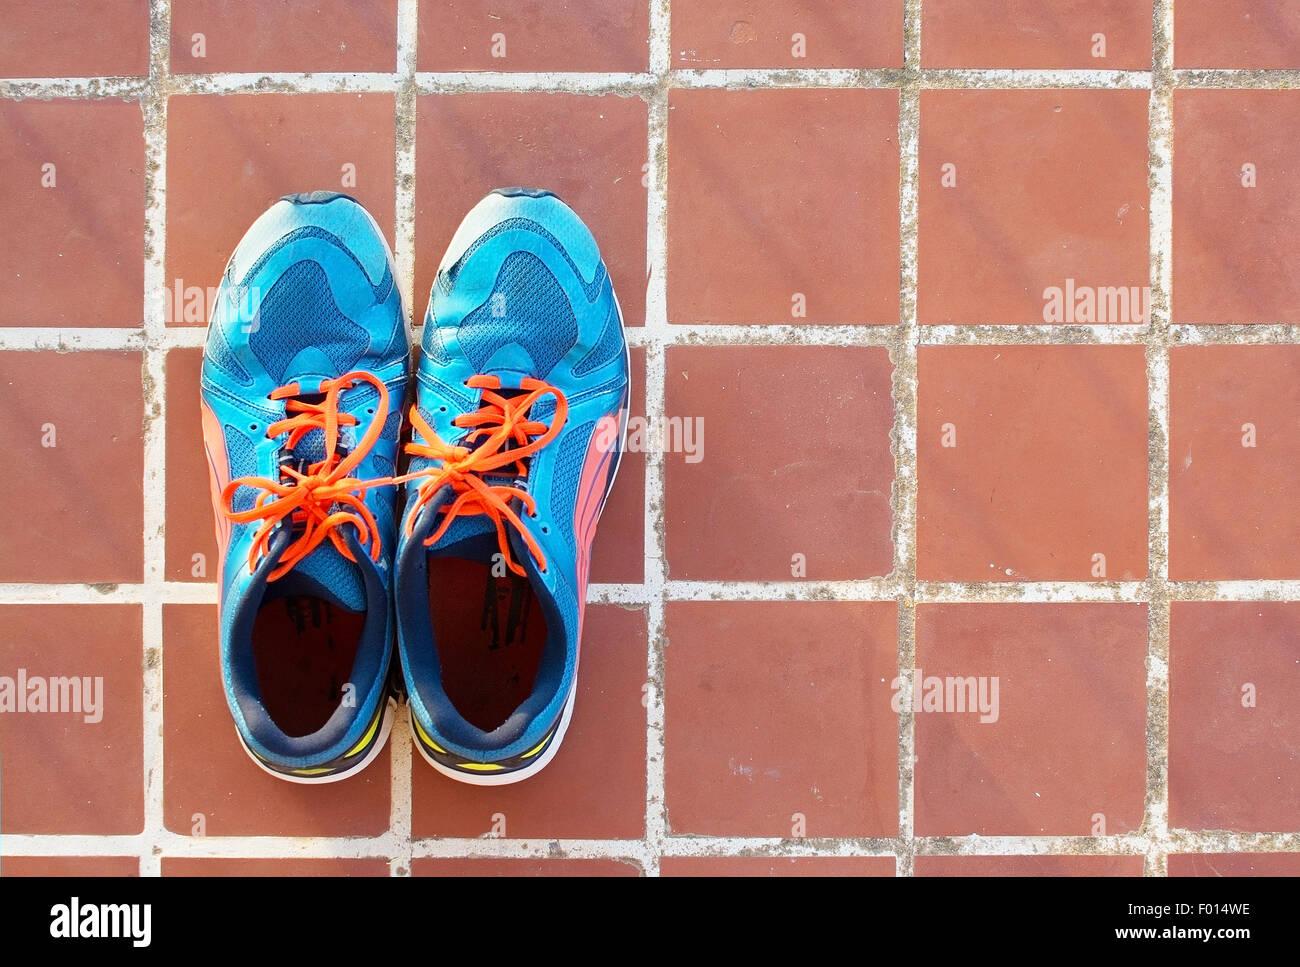 Calzado deportivo azul sobre suelo de terracota azulejo cuadrado textura de fondo. Imagen De Stock